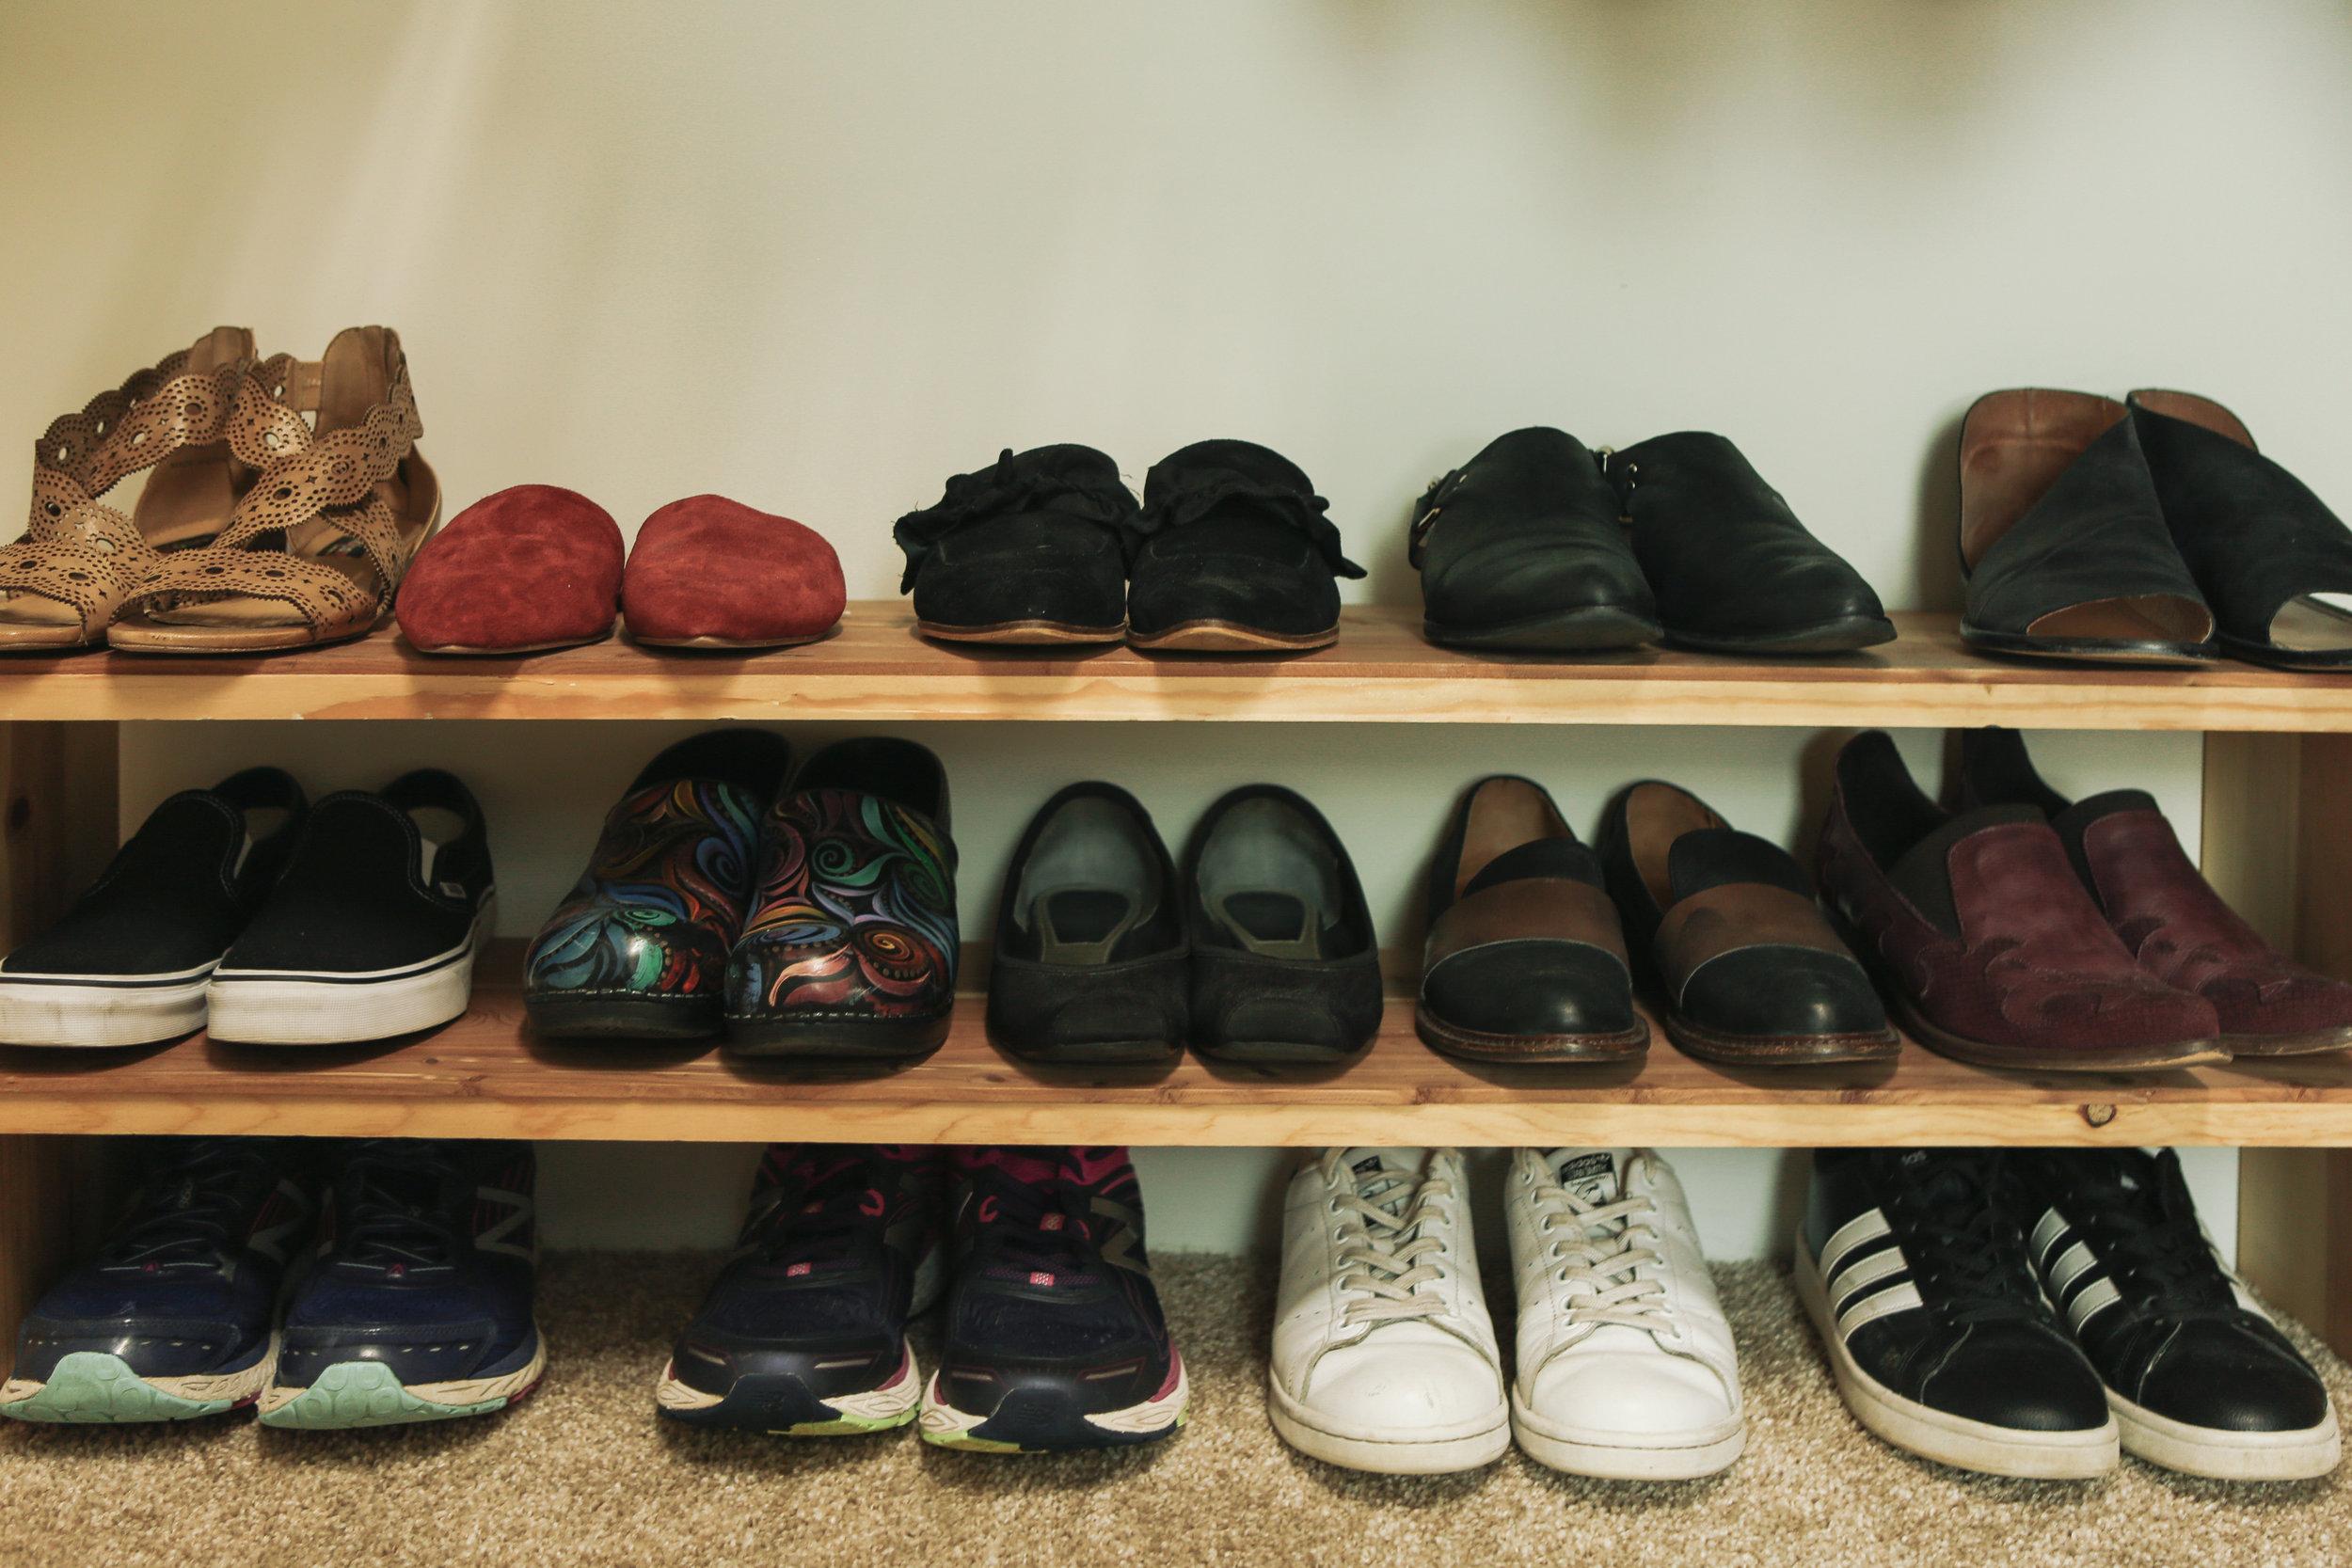 Shoe storage and organization by Simplify Studio